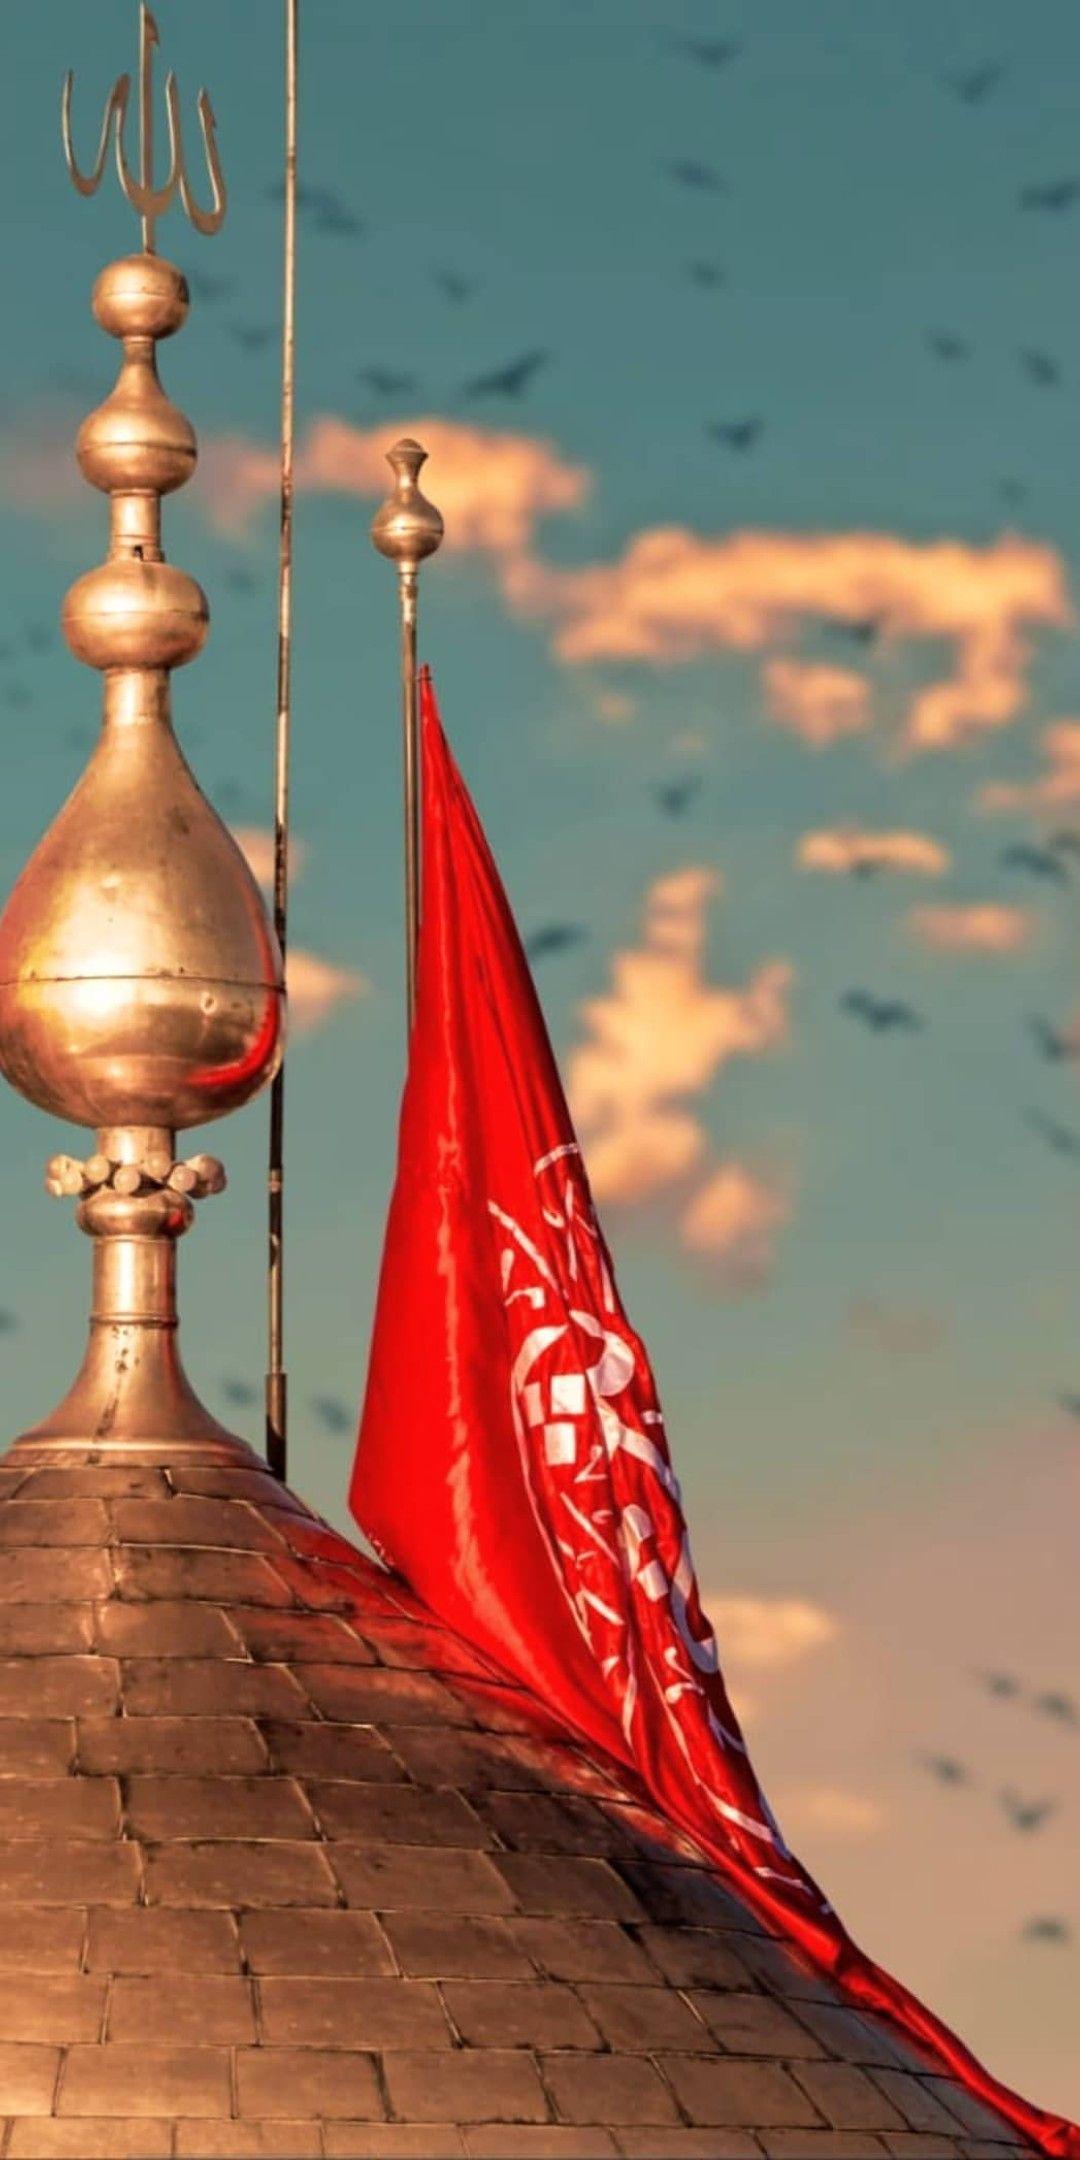 Aaqa Abbasع Abalfazlalabbas Alabbas Karbala Iraq Muharram